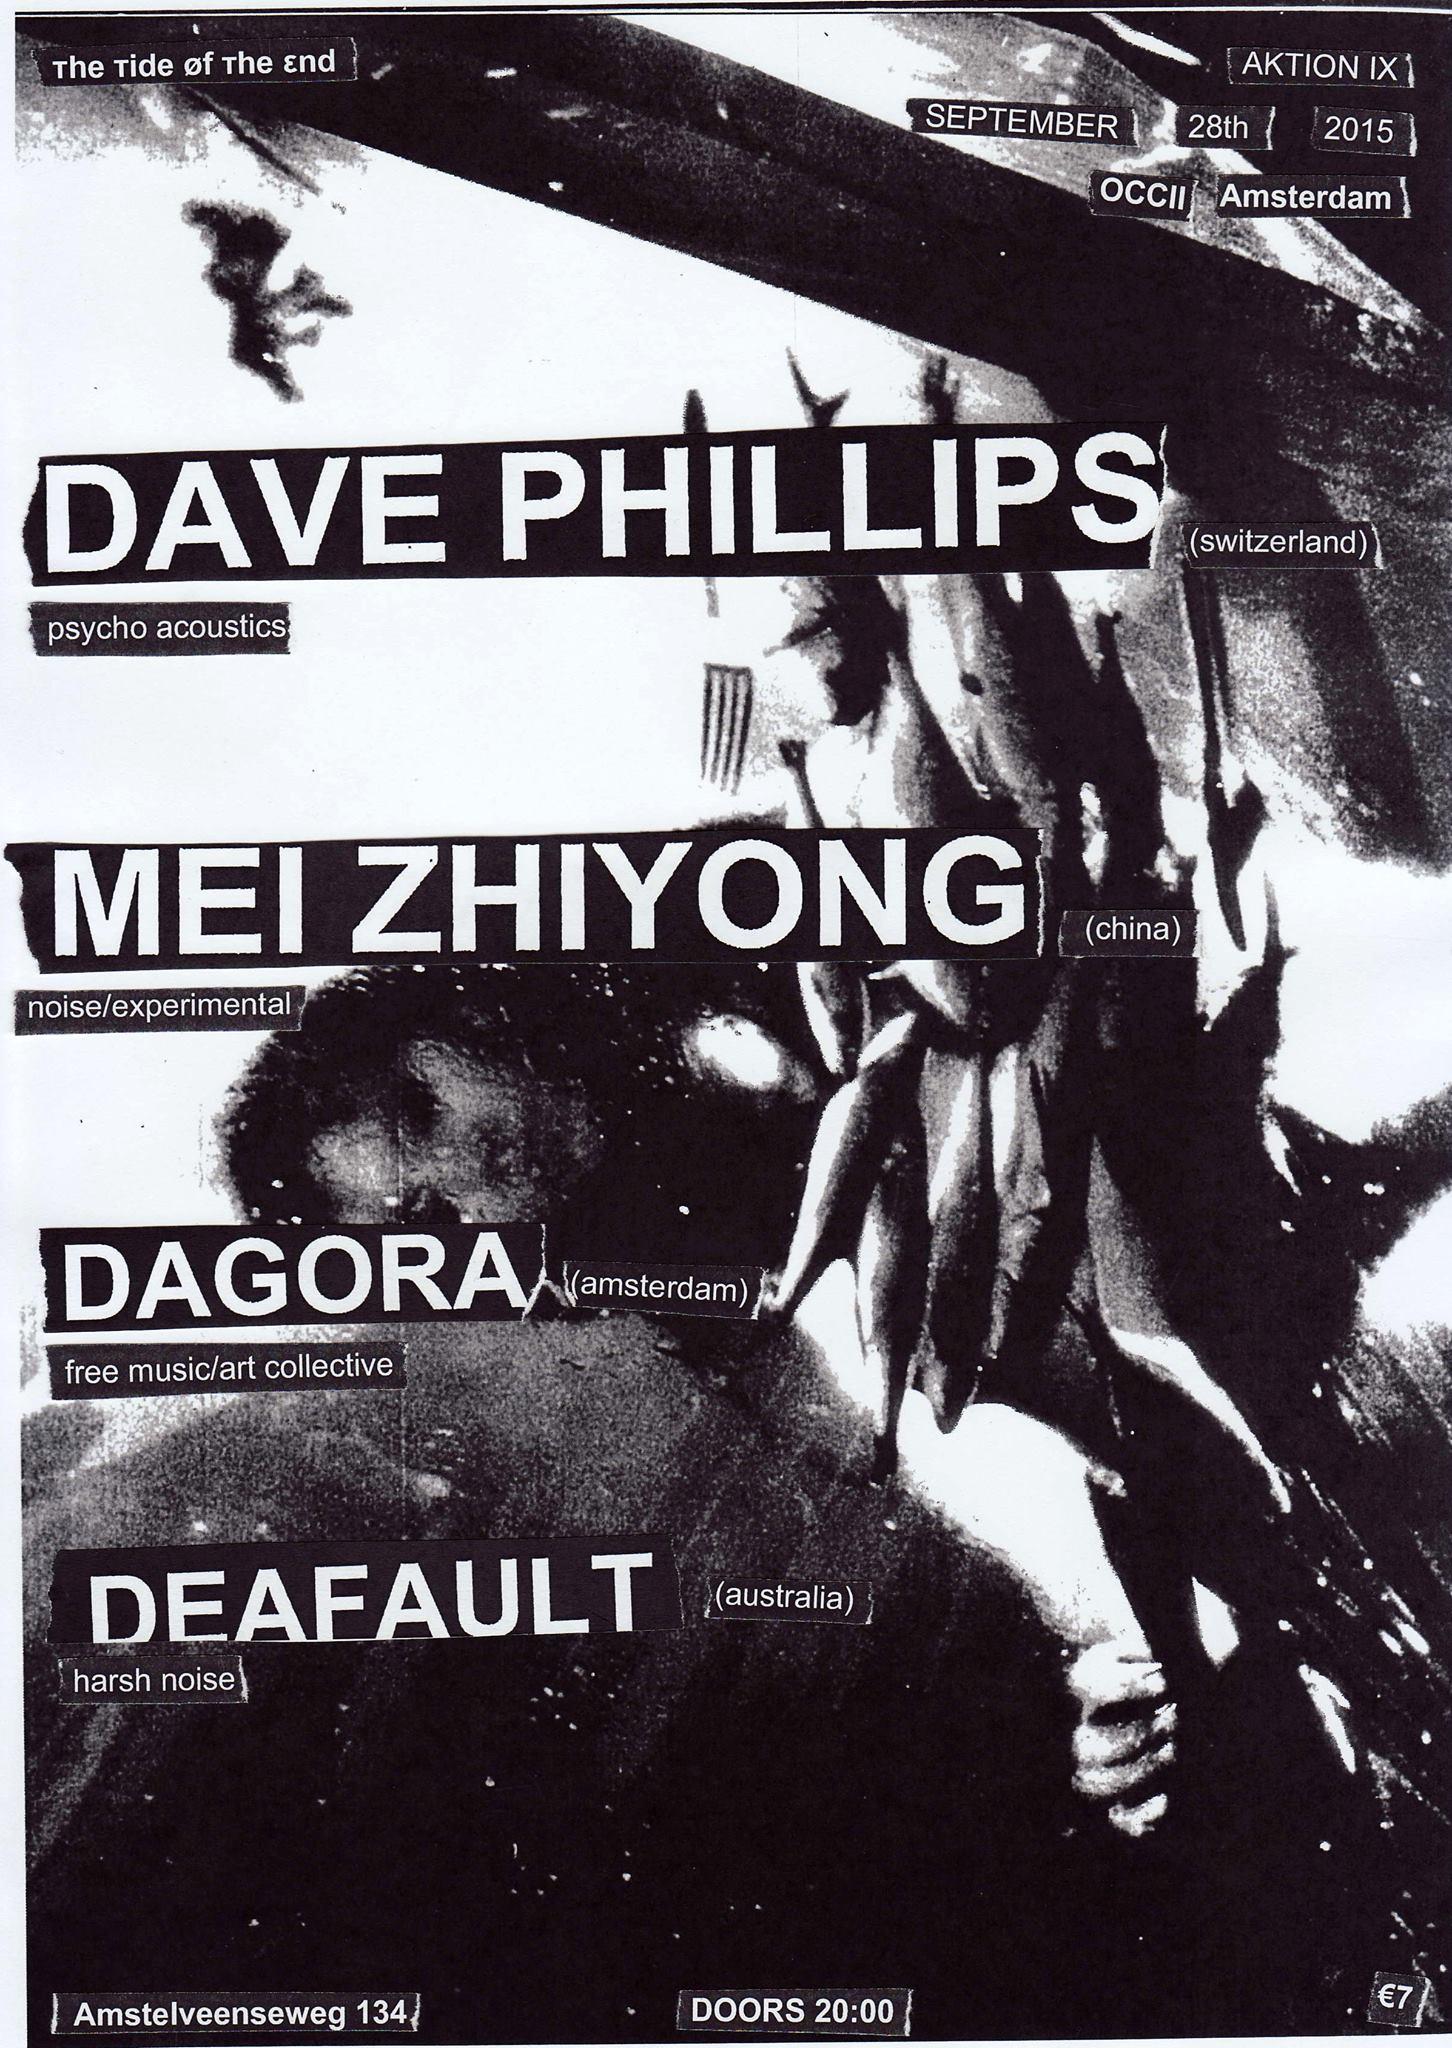 [ттøтε] AKTION IX -w/ DAVE PHILLIPS (ch) + MEI ZHIYONG (cn) + DAGORA + DEAFAULT (au)